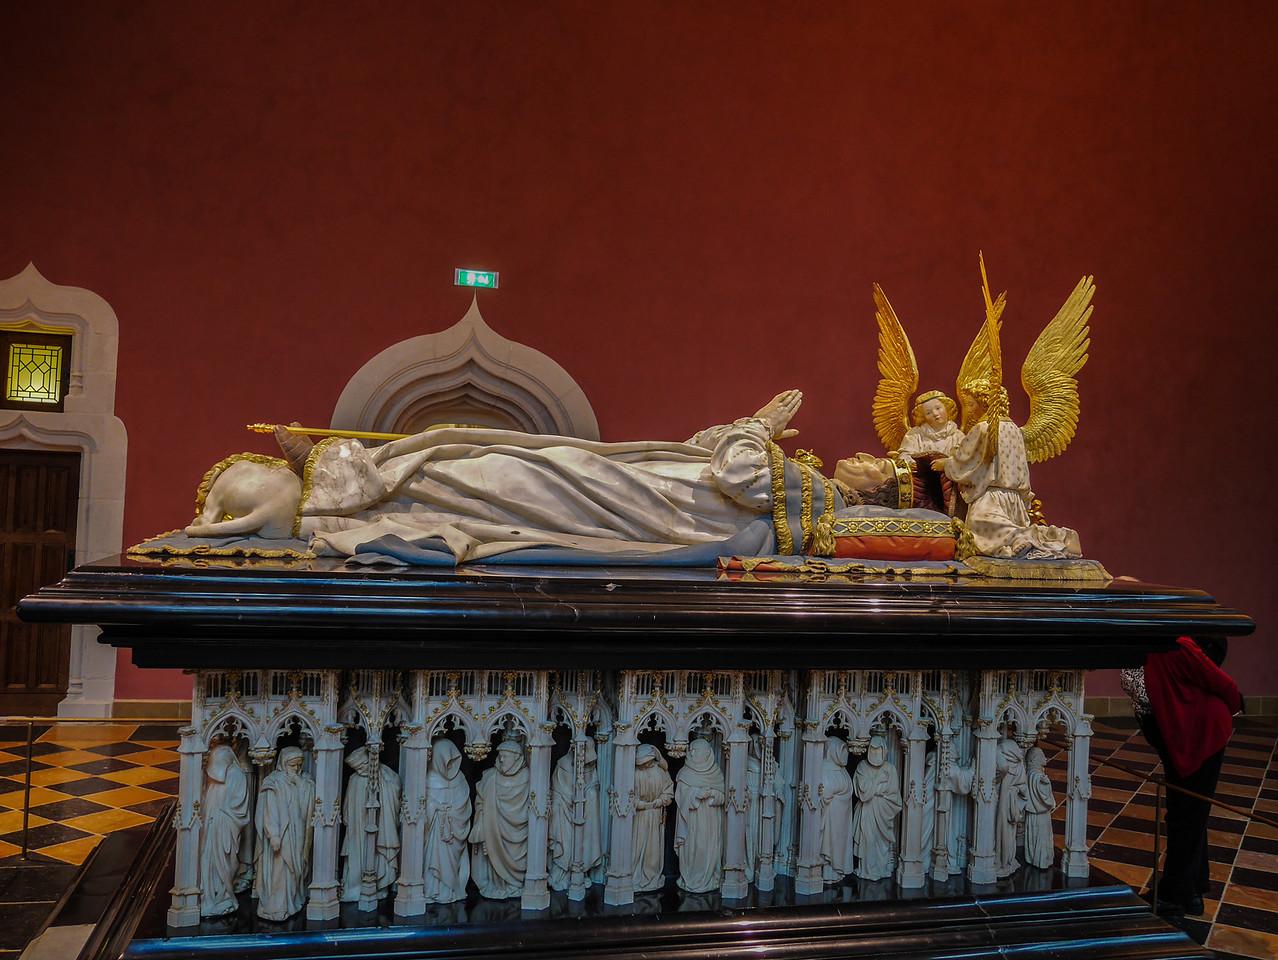 Dijon Beaux Arts Museum -The Tomb of Philip The Bold, Duke of Burgundy